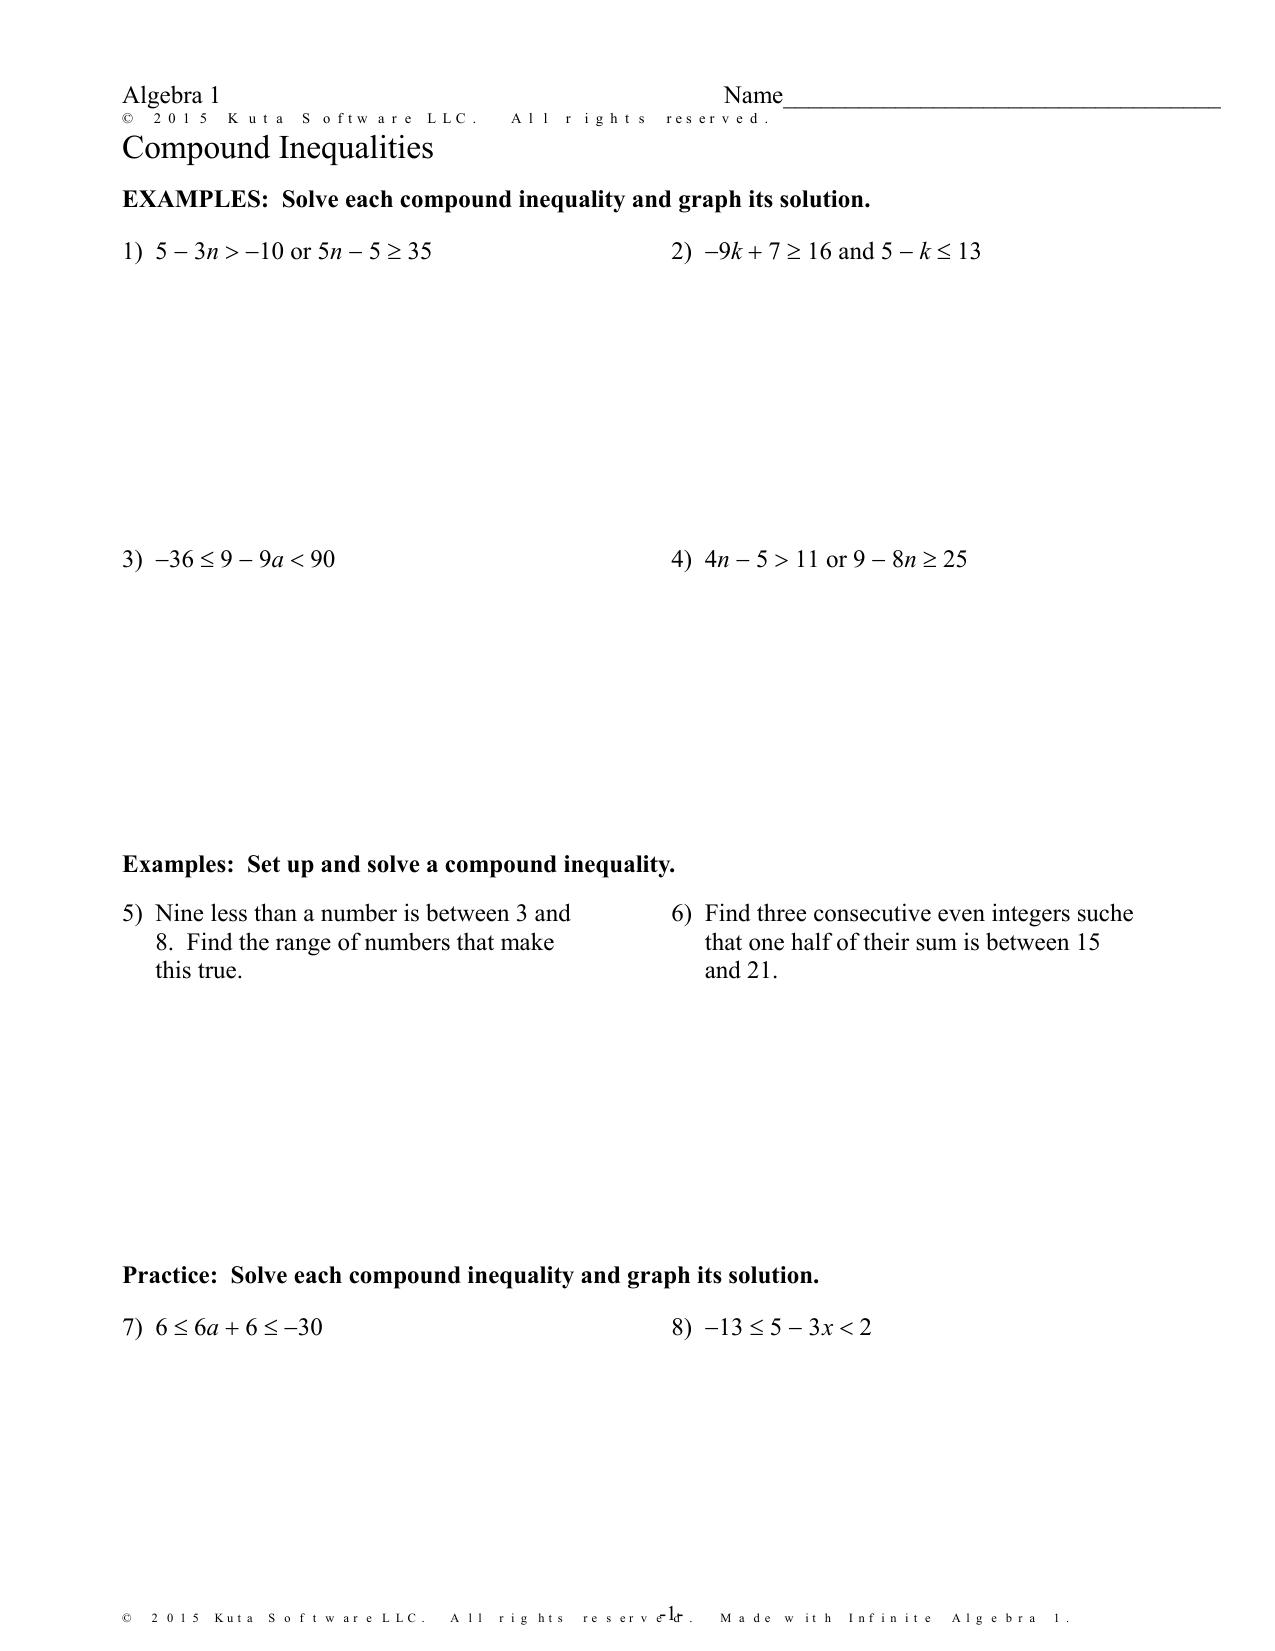 Infinite Algebra 24 - Compound Inequalities With Algebra 1 Inequalities Worksheet